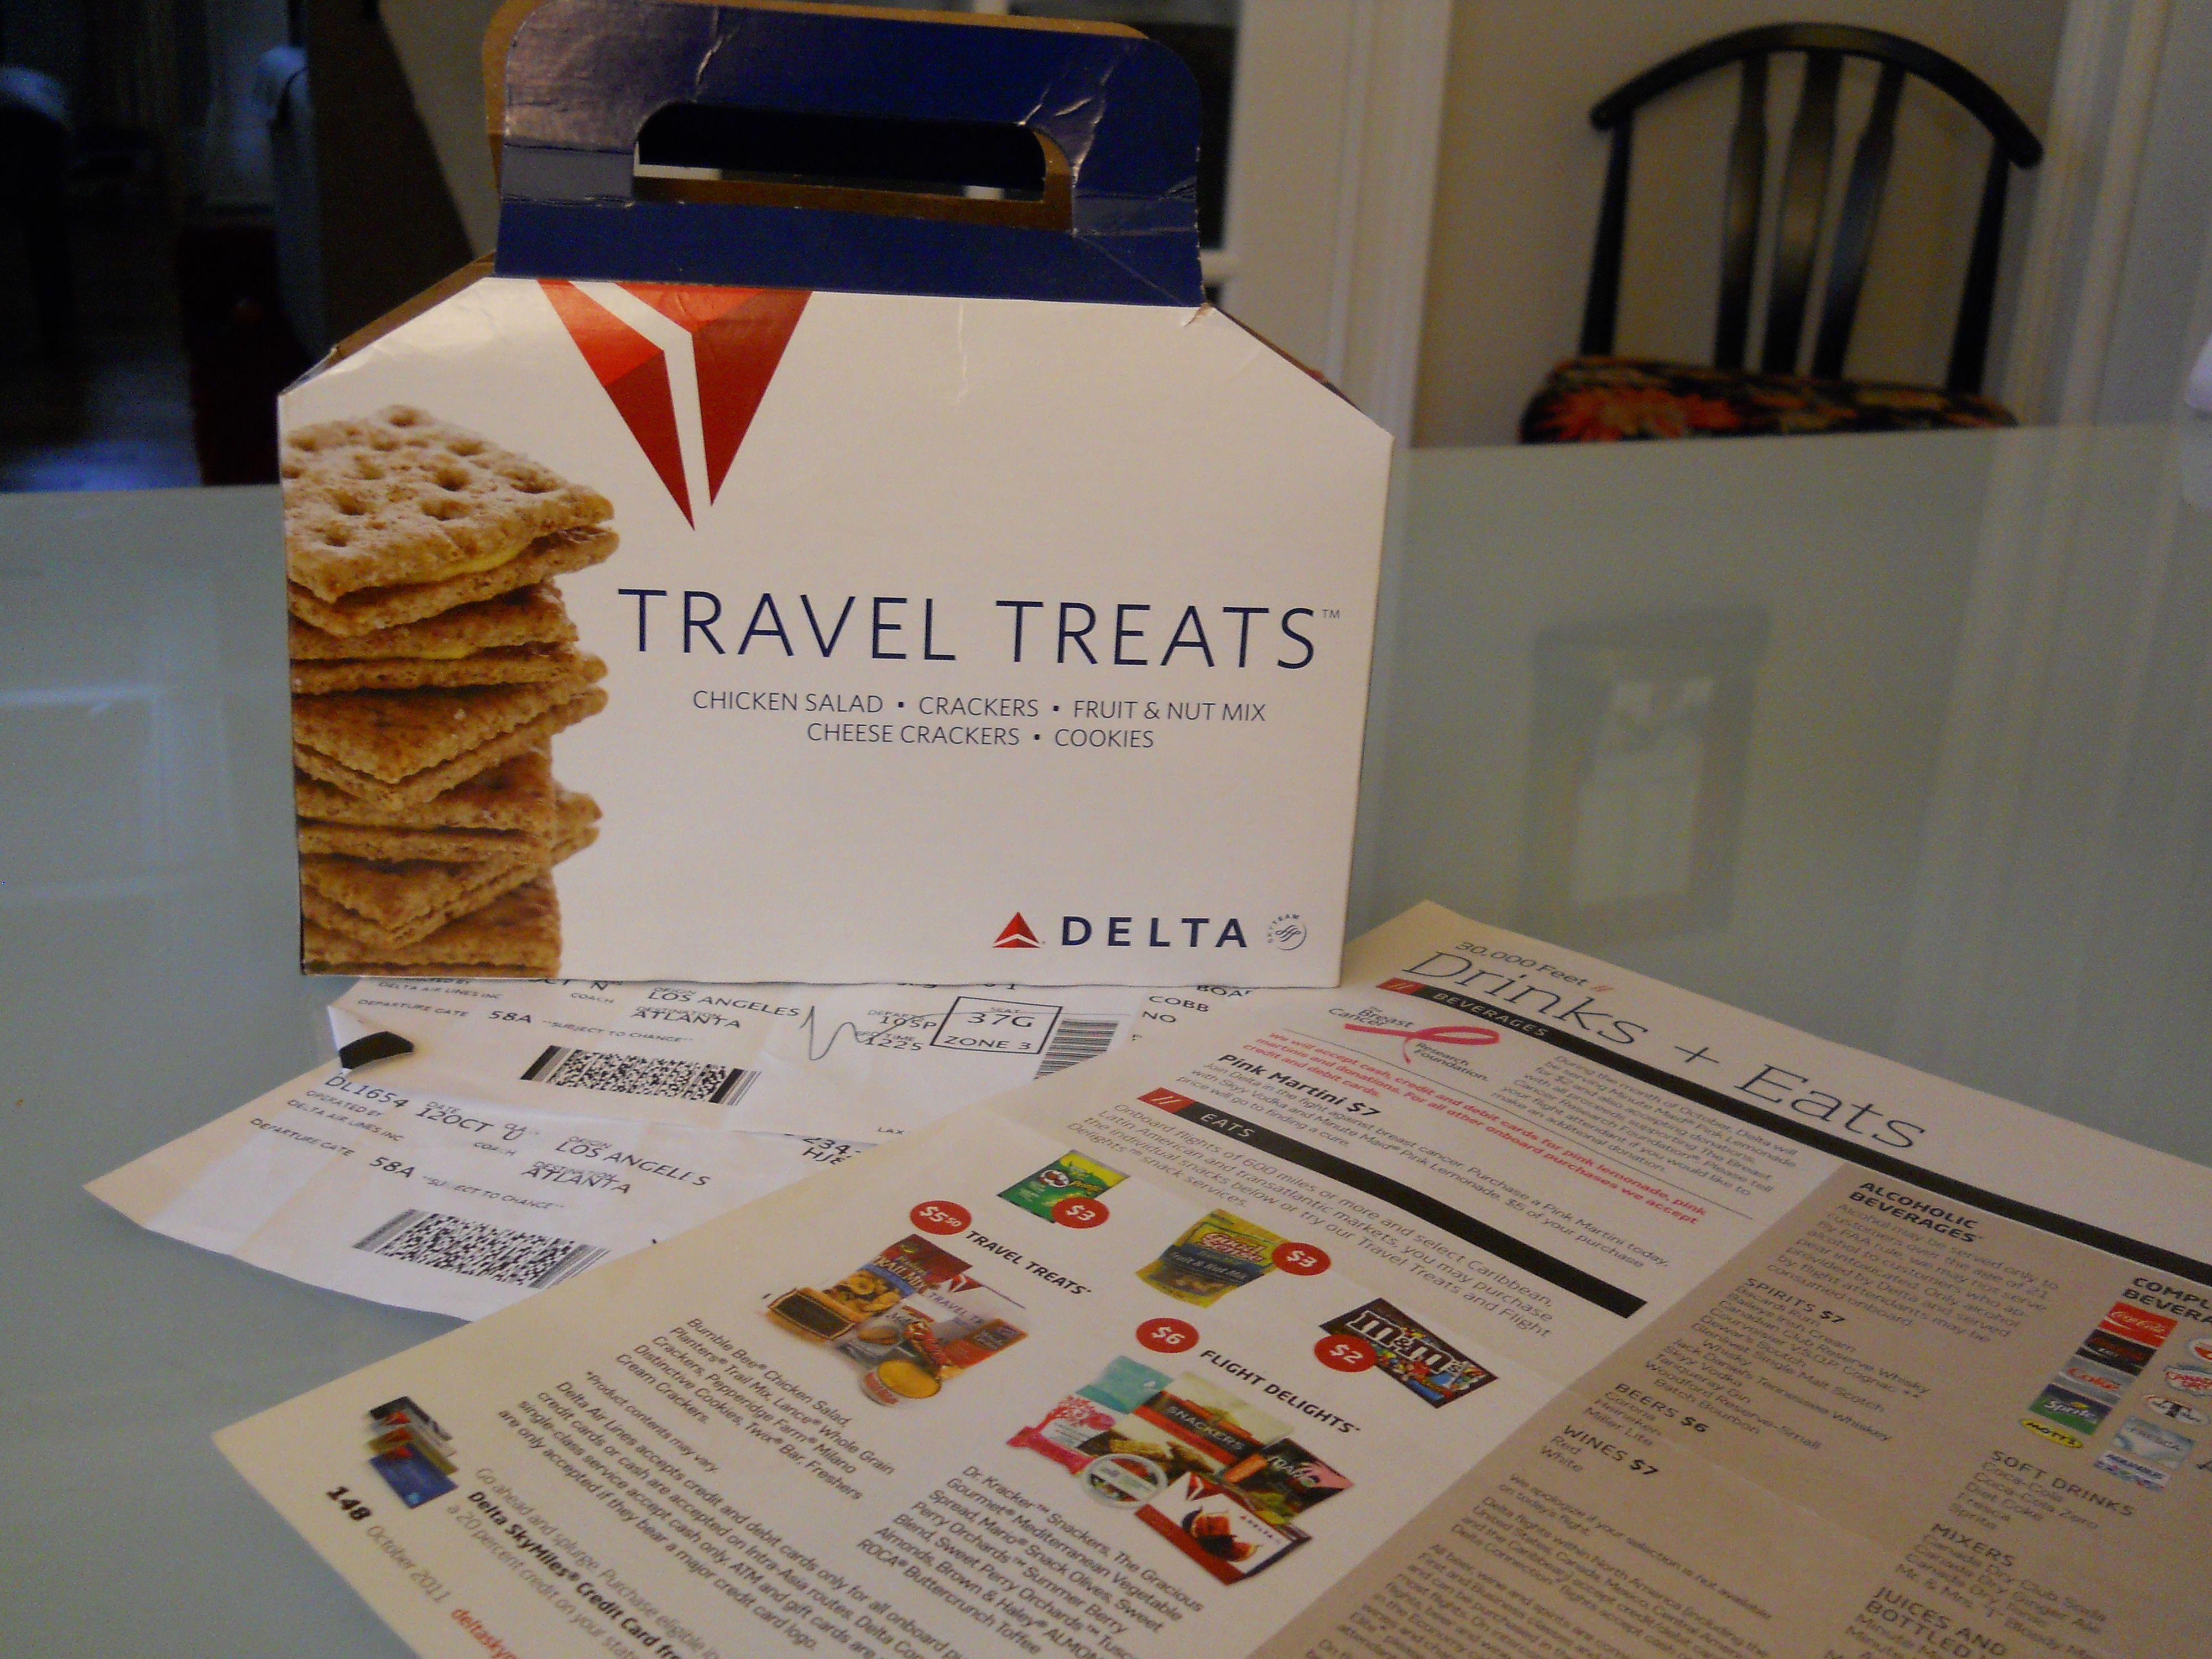 Some Travel Treat